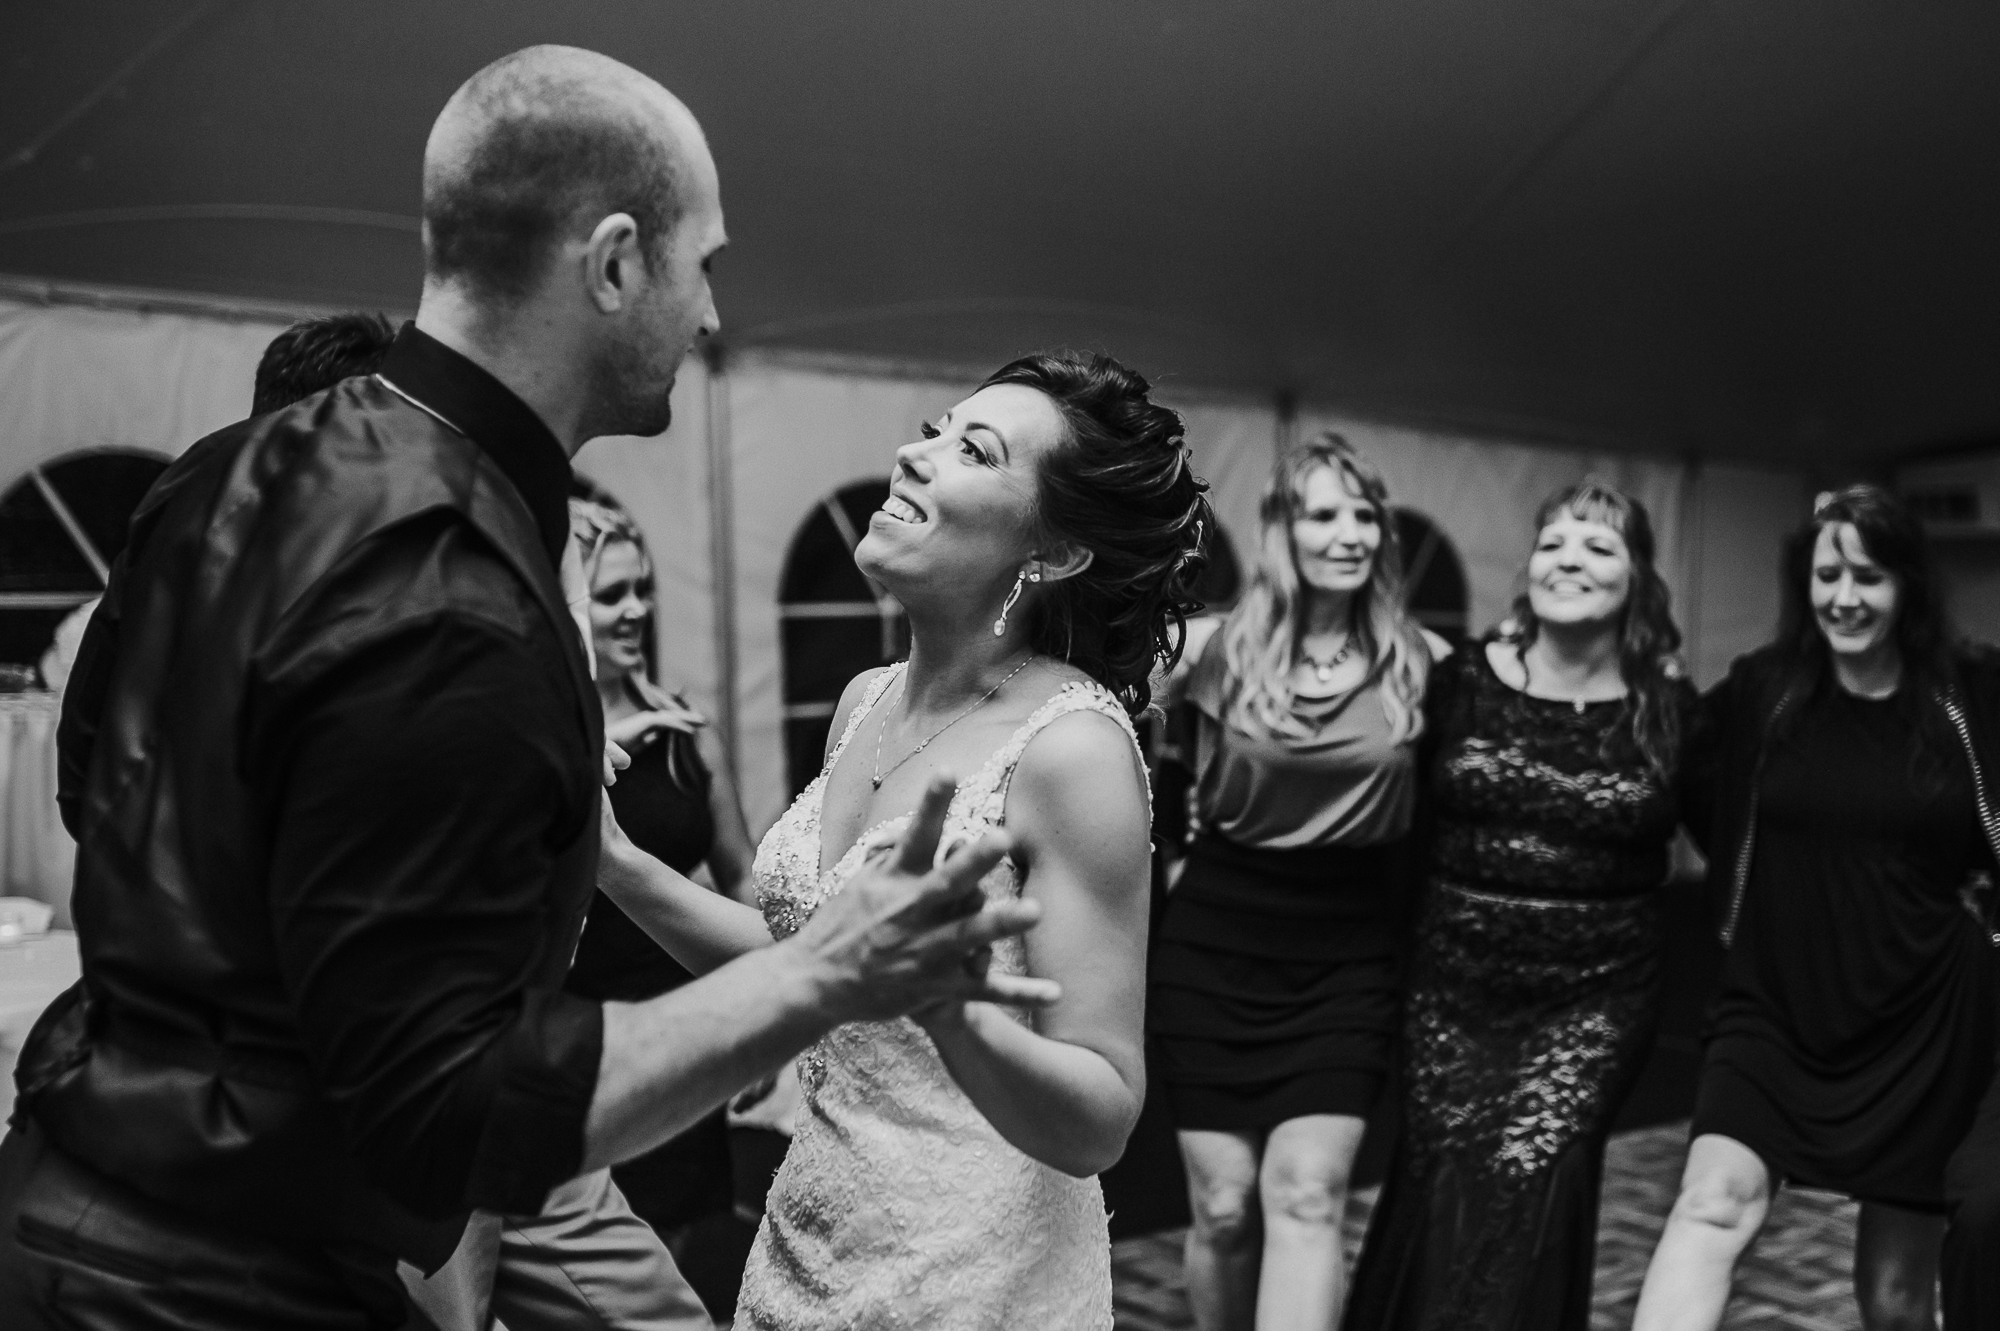 Christina-and-Gene-Wedding-Marla-Rain-Photography-654.jpg